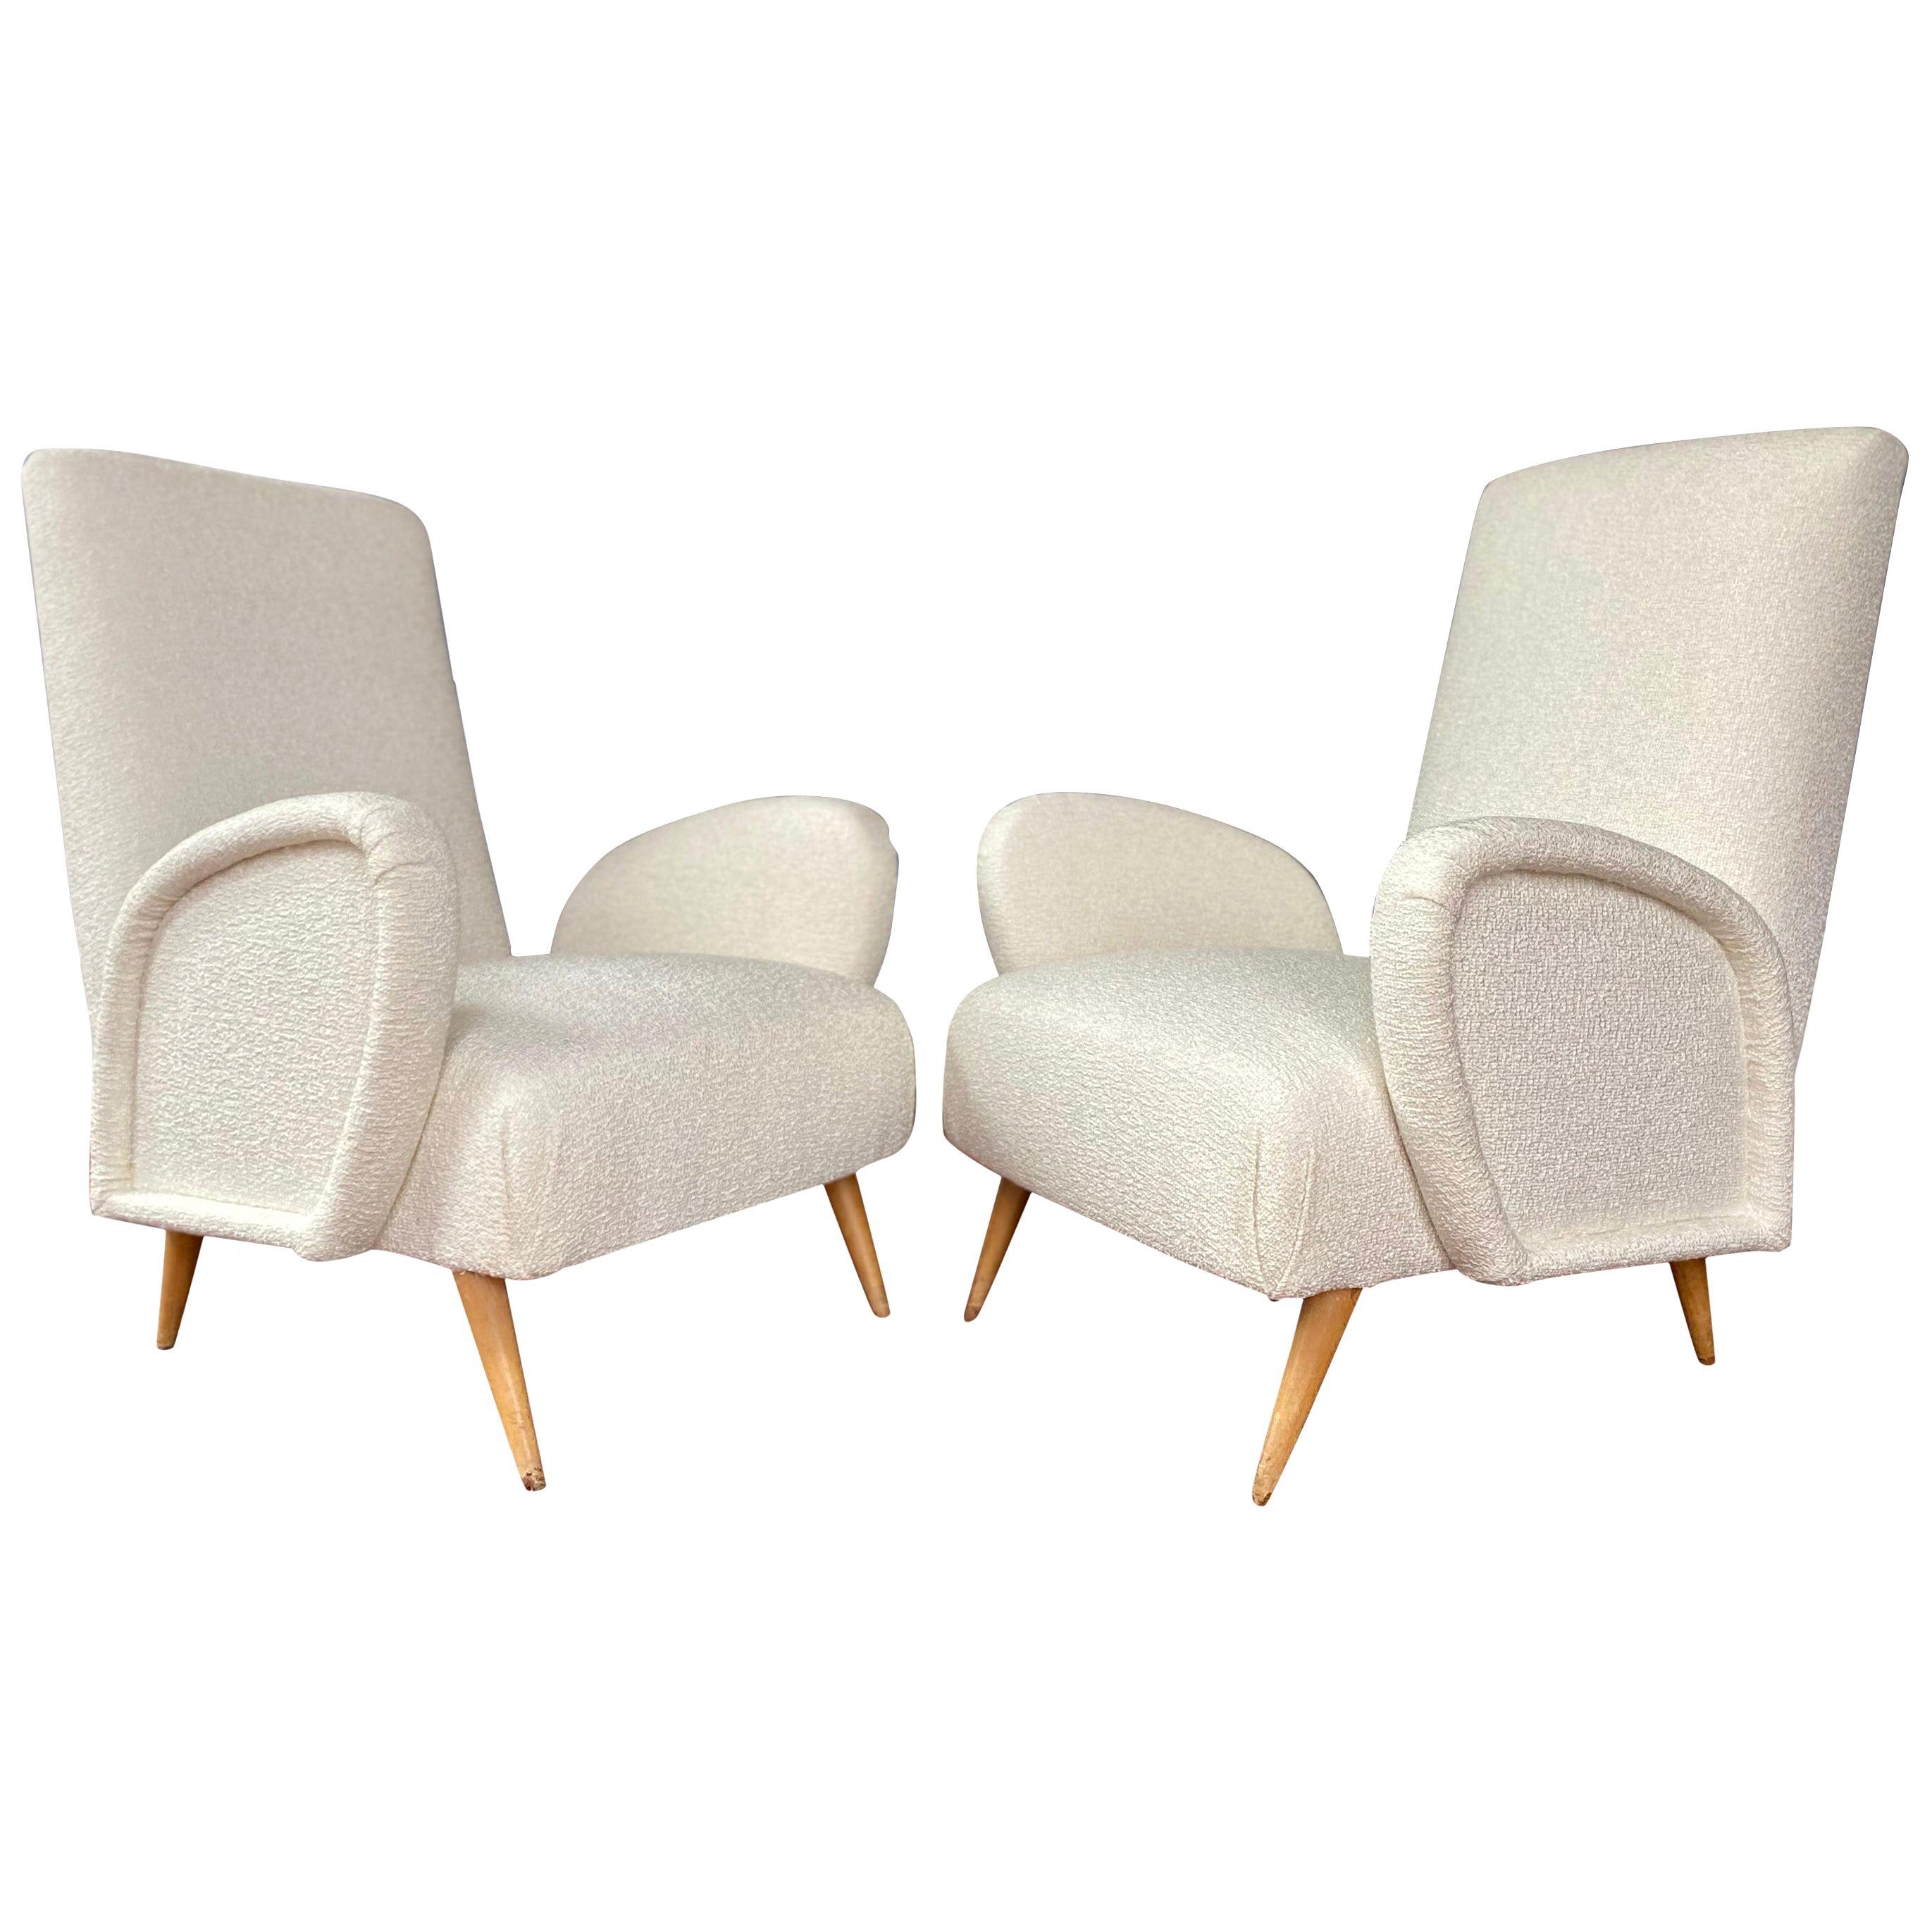 Pair of Italian Midcentury Armchairs Gio Ponti Club Chairs Ivory Bouclette